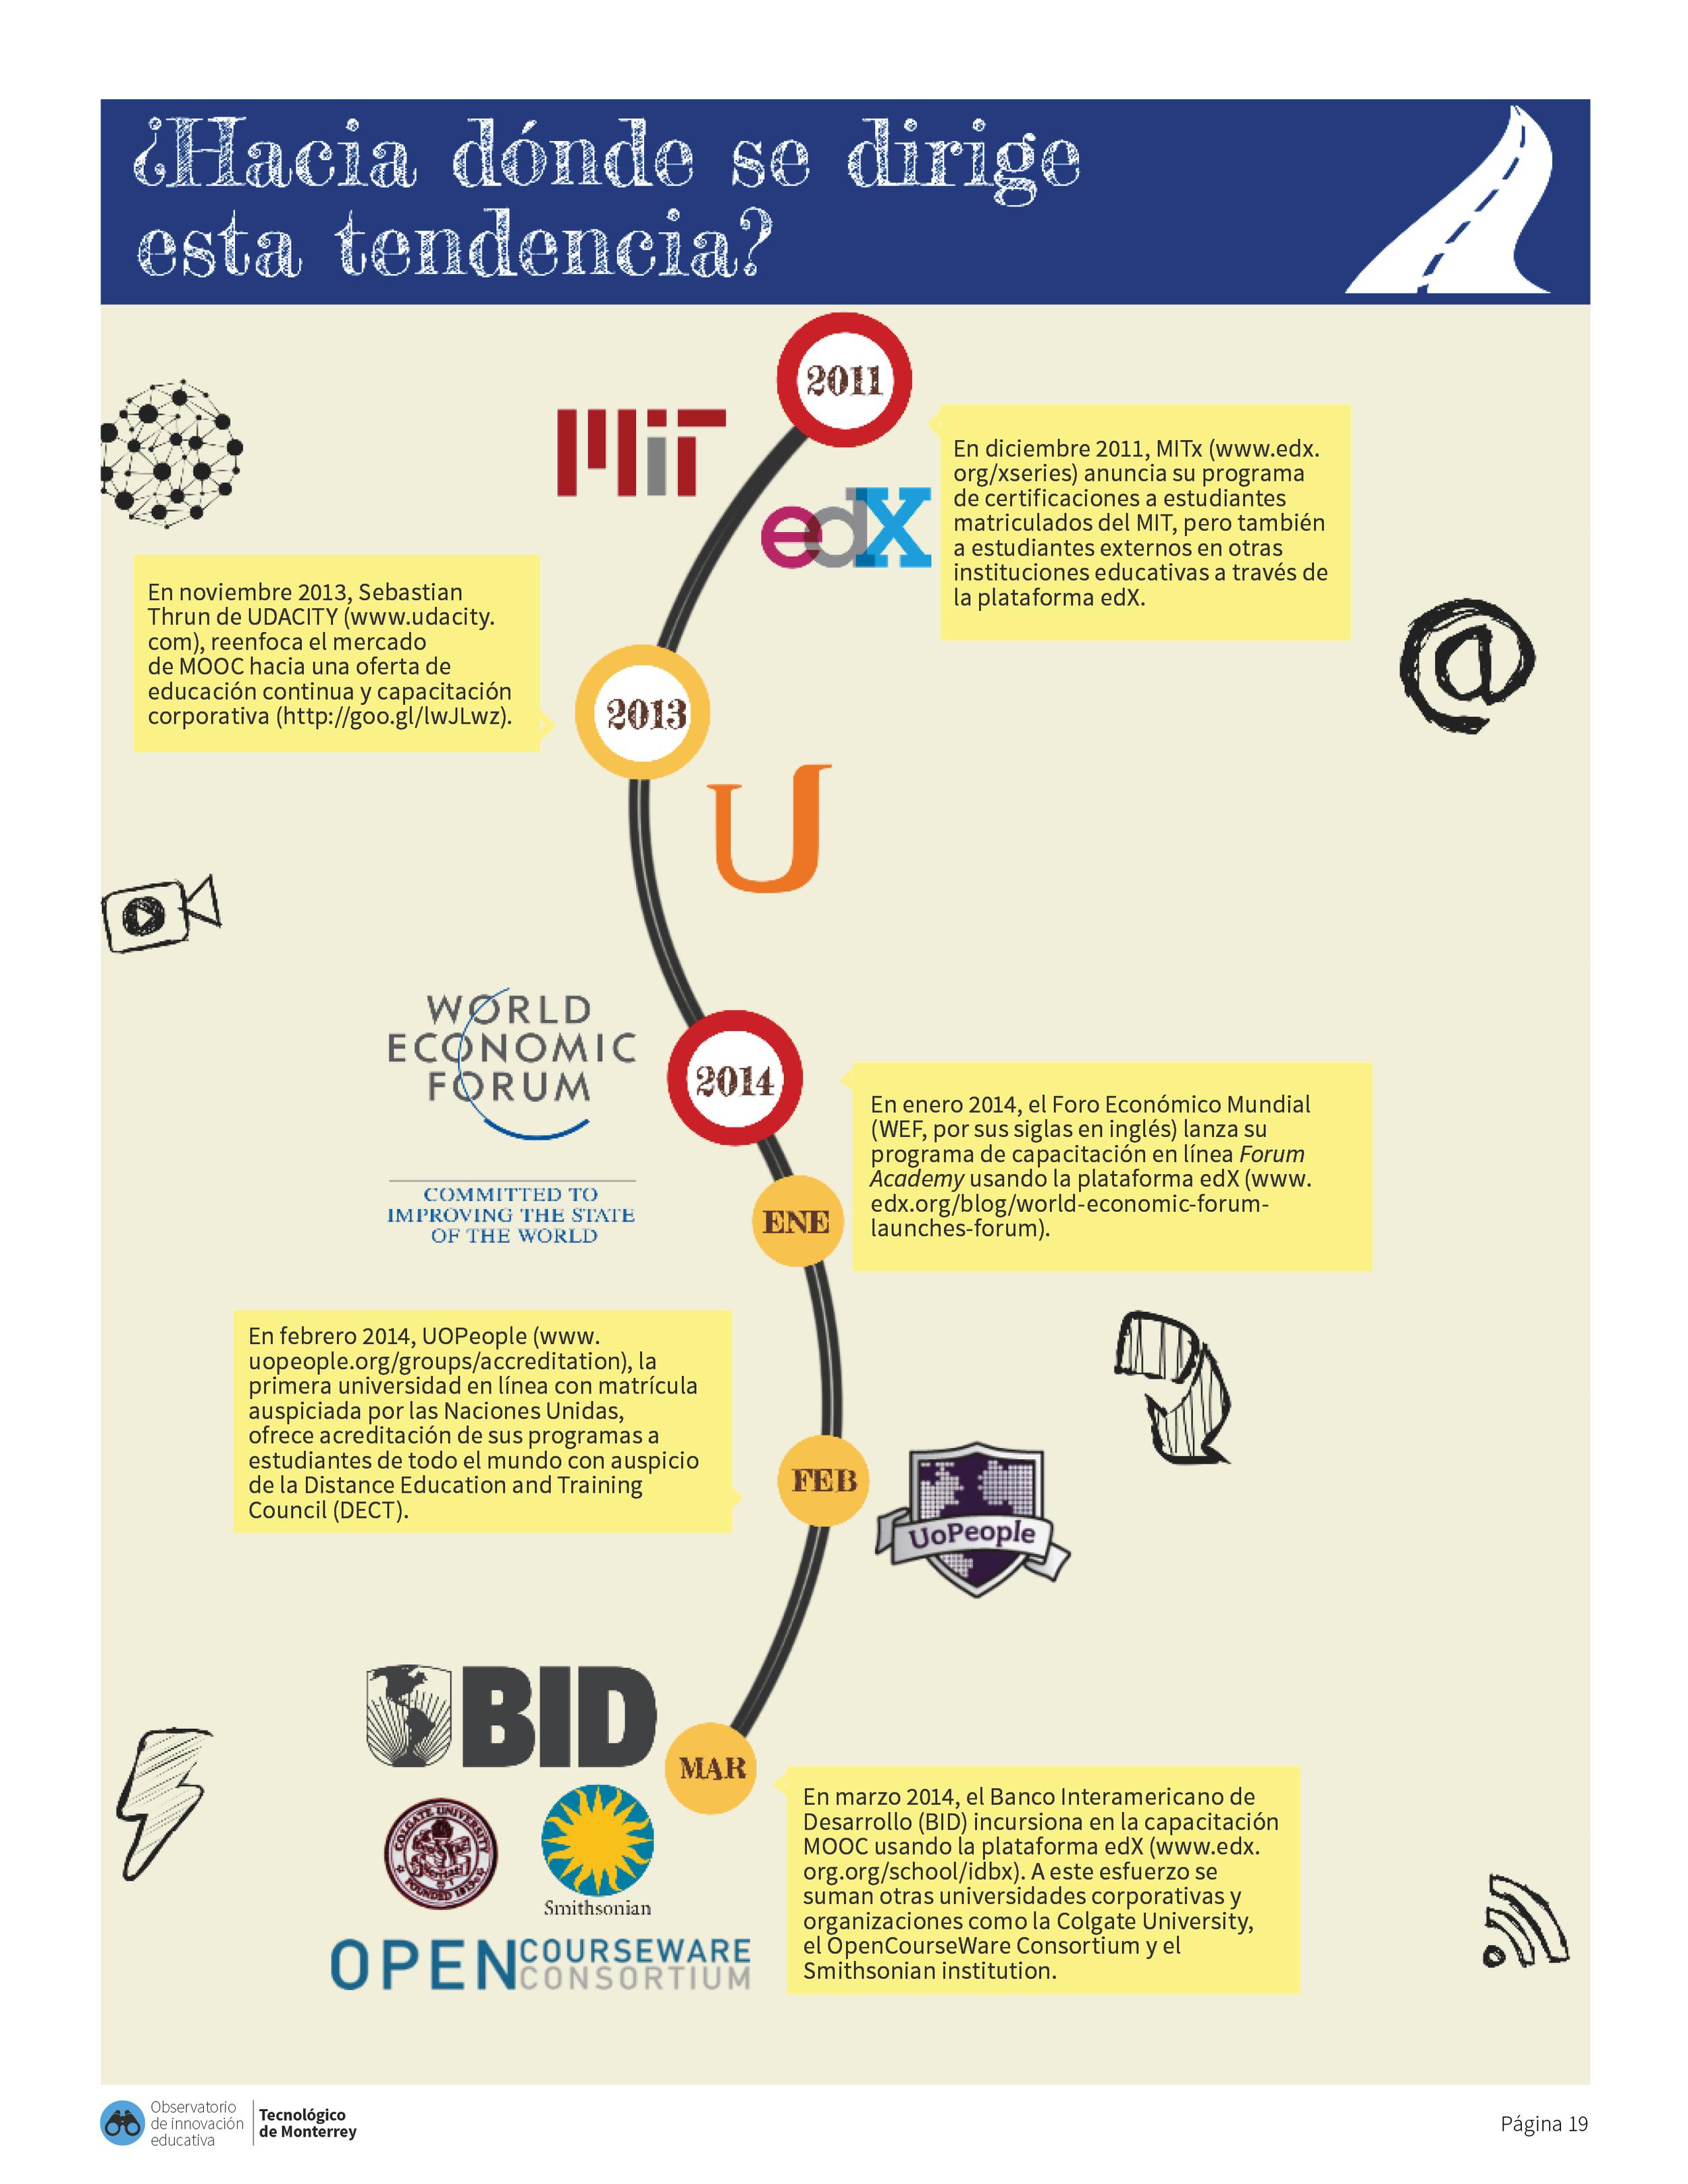 Edu Trends - MOOC19.png